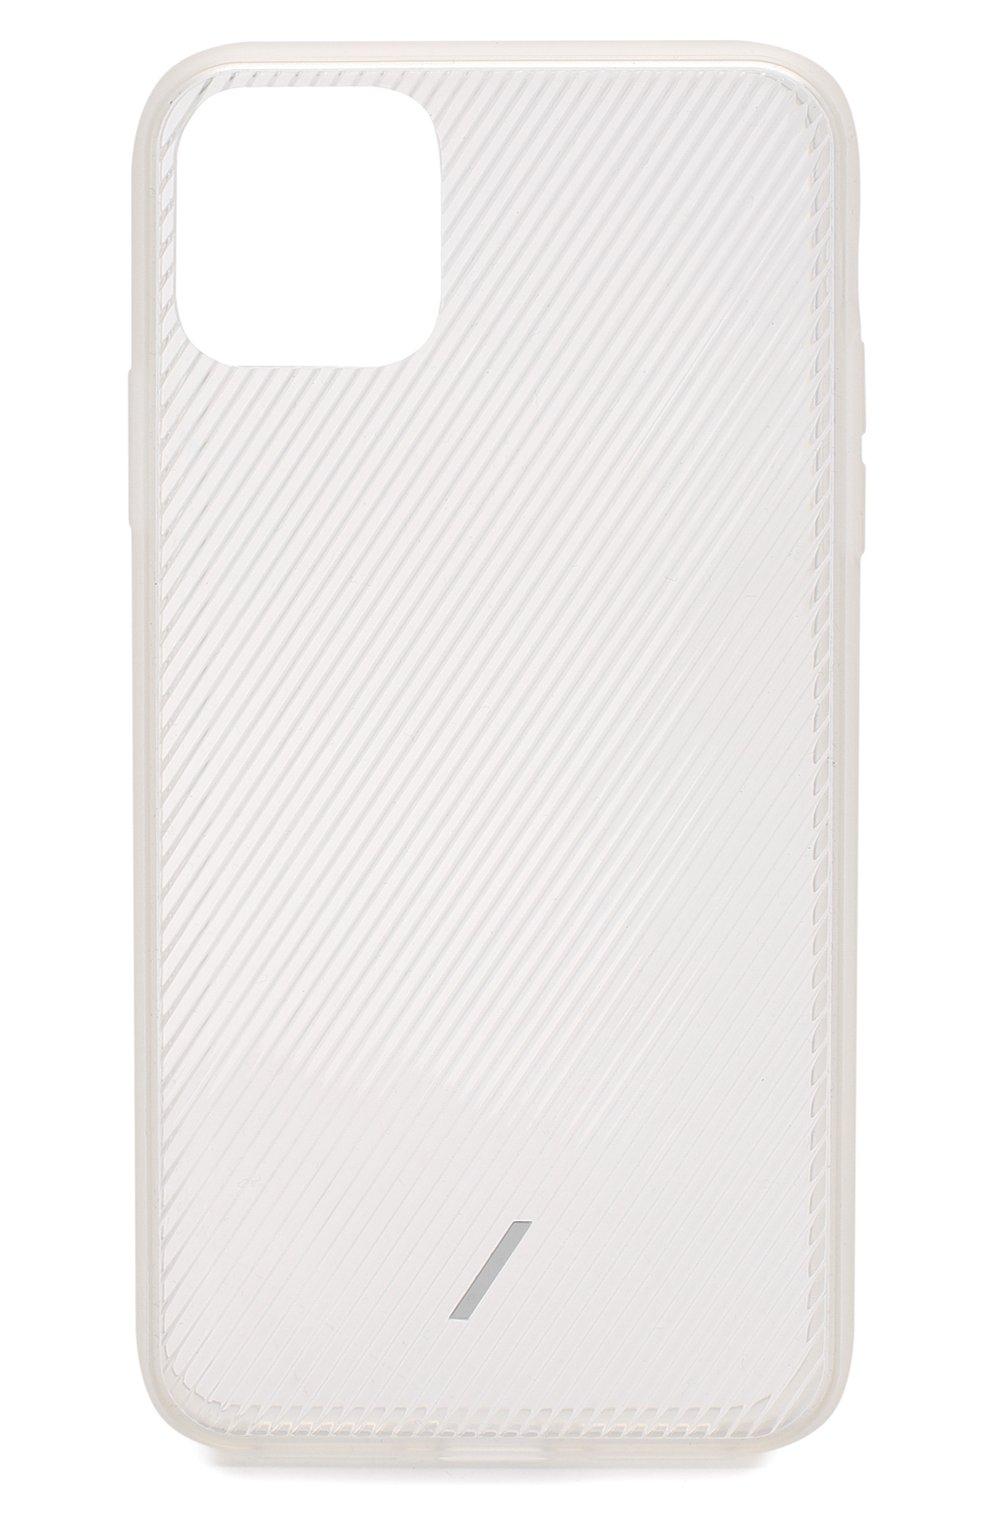 Мужской чехол для iphone 11 pro max NATIVE UNION прозрачного цвета, арт. CVIEW-FRO-NP19L   Фото 1